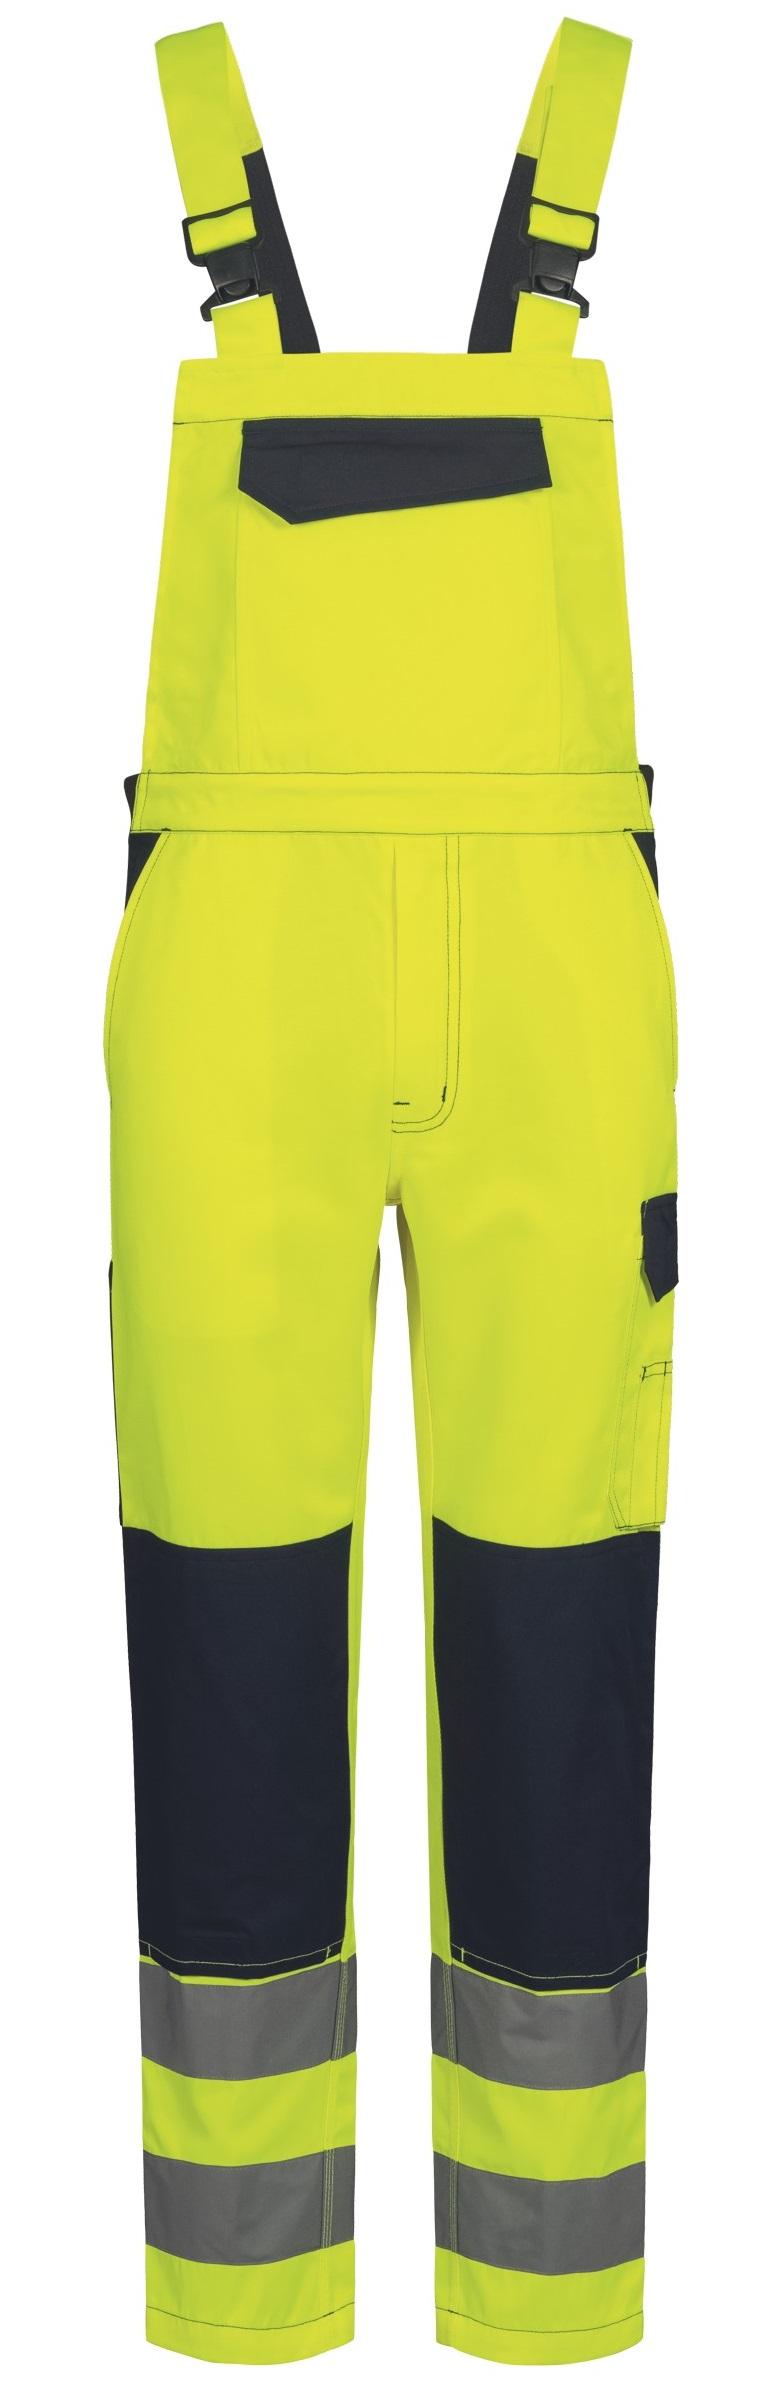 F-Warnschutz-Latzhose, *BORNA*, gelb/marine